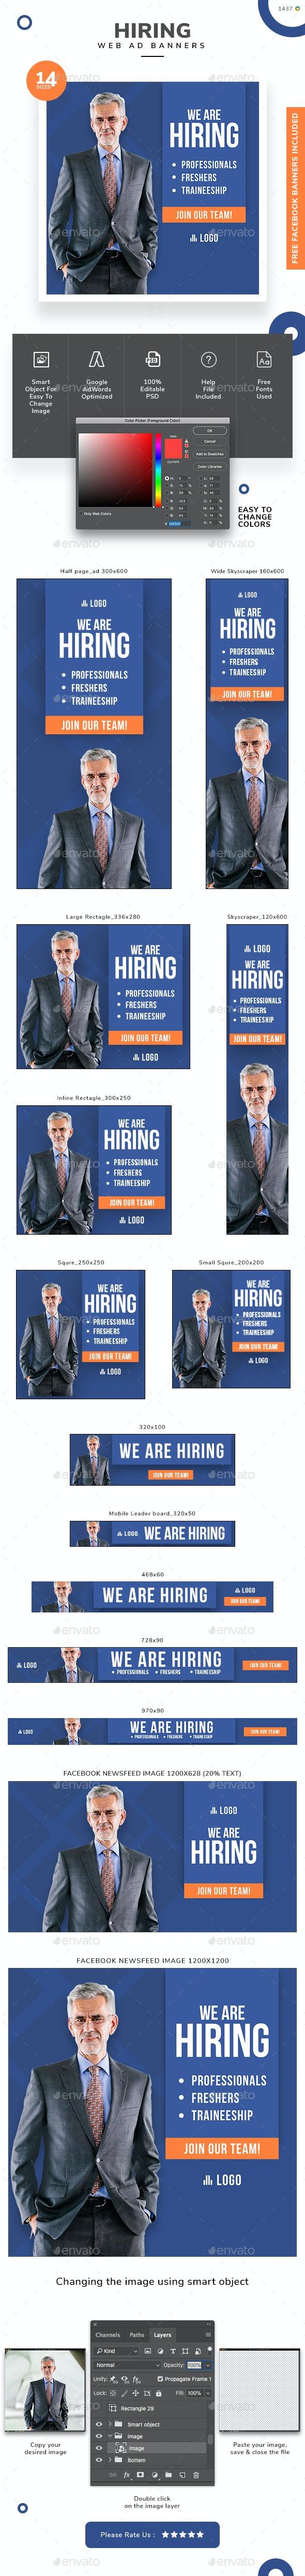 Hiring Web Banner Set - Banners & Ads Web Elements